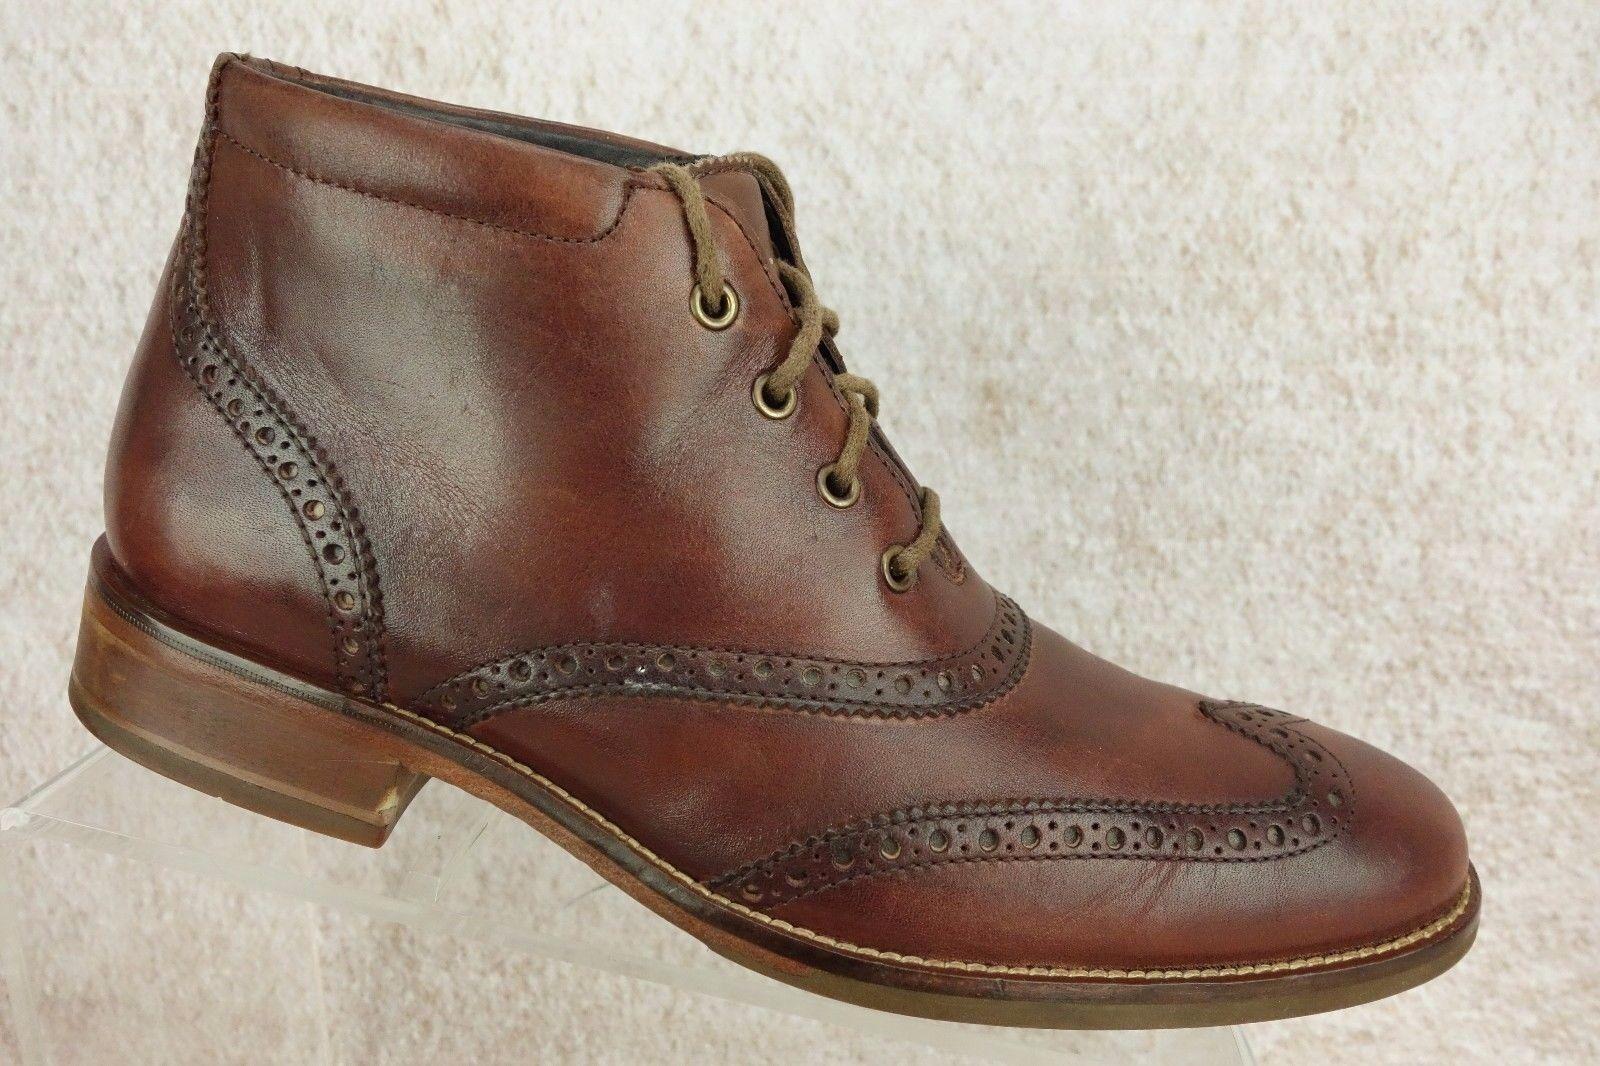 Cole Haan Williams Braun Leder Schuhes Wingtip Brogue Ankle Stiefel Schuhes Leder   Herren 7.5 M 8d9763